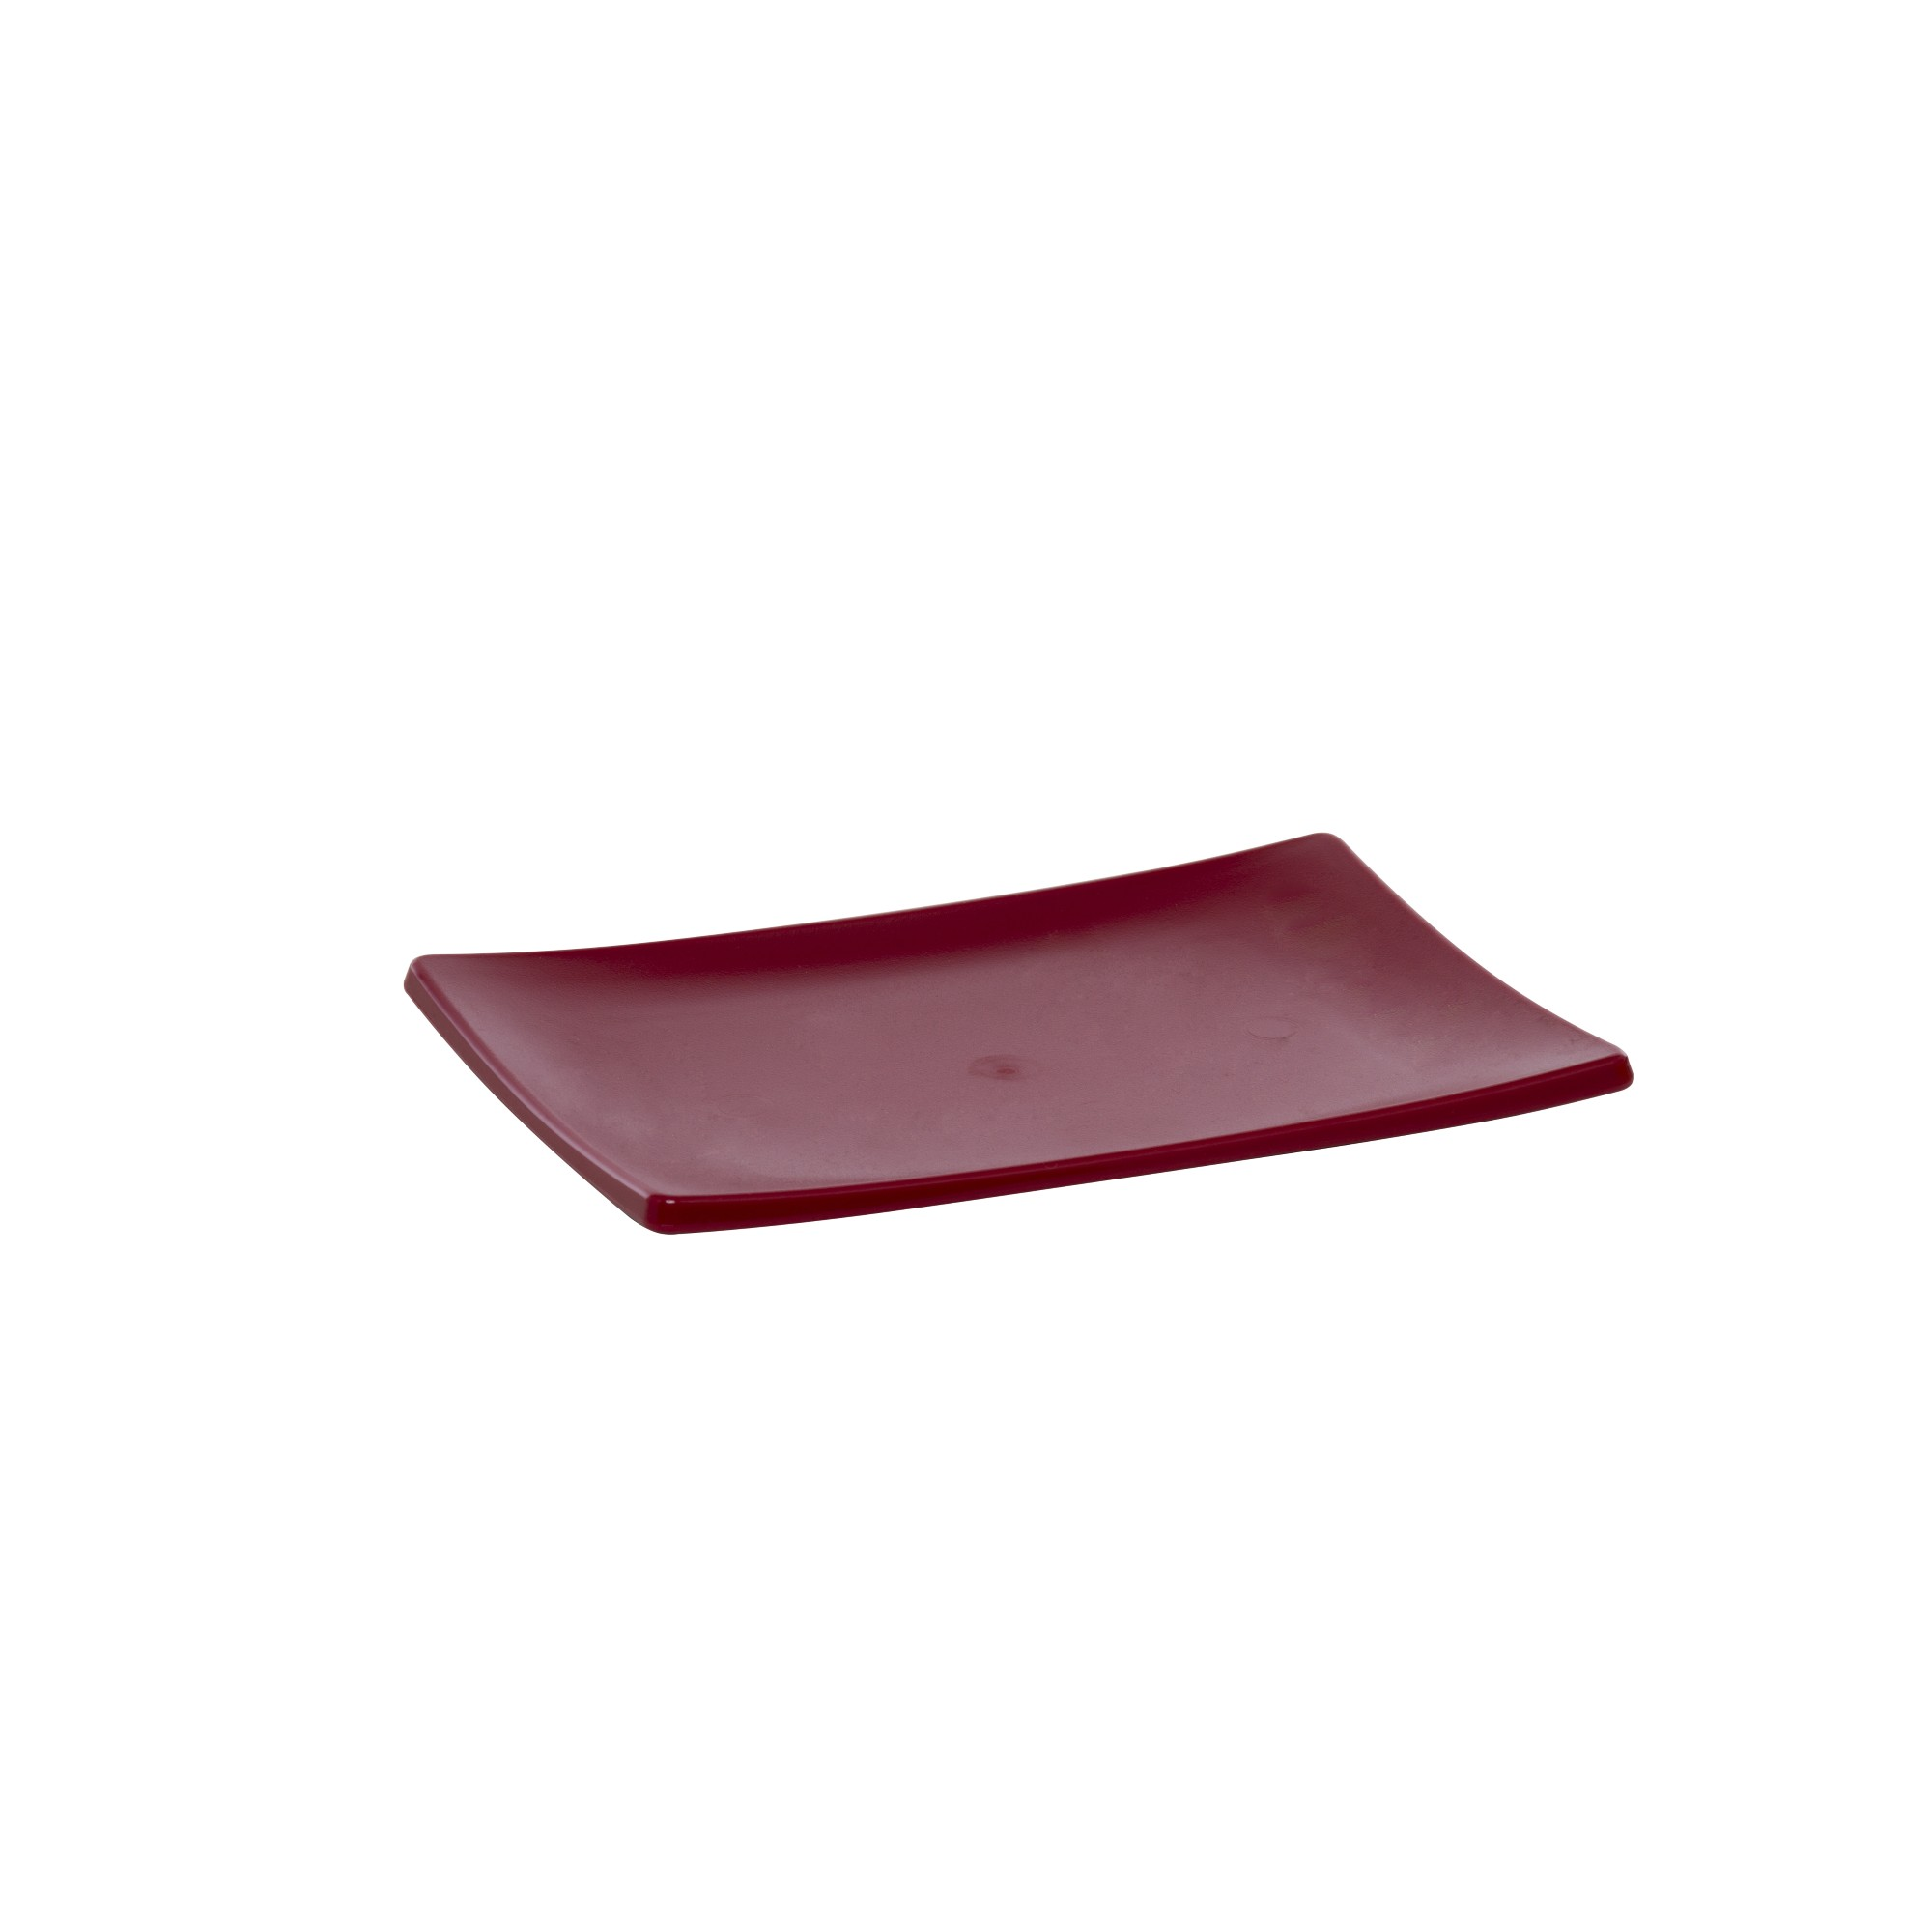 Petisqueira de Plastico 20cm - Vem Plast